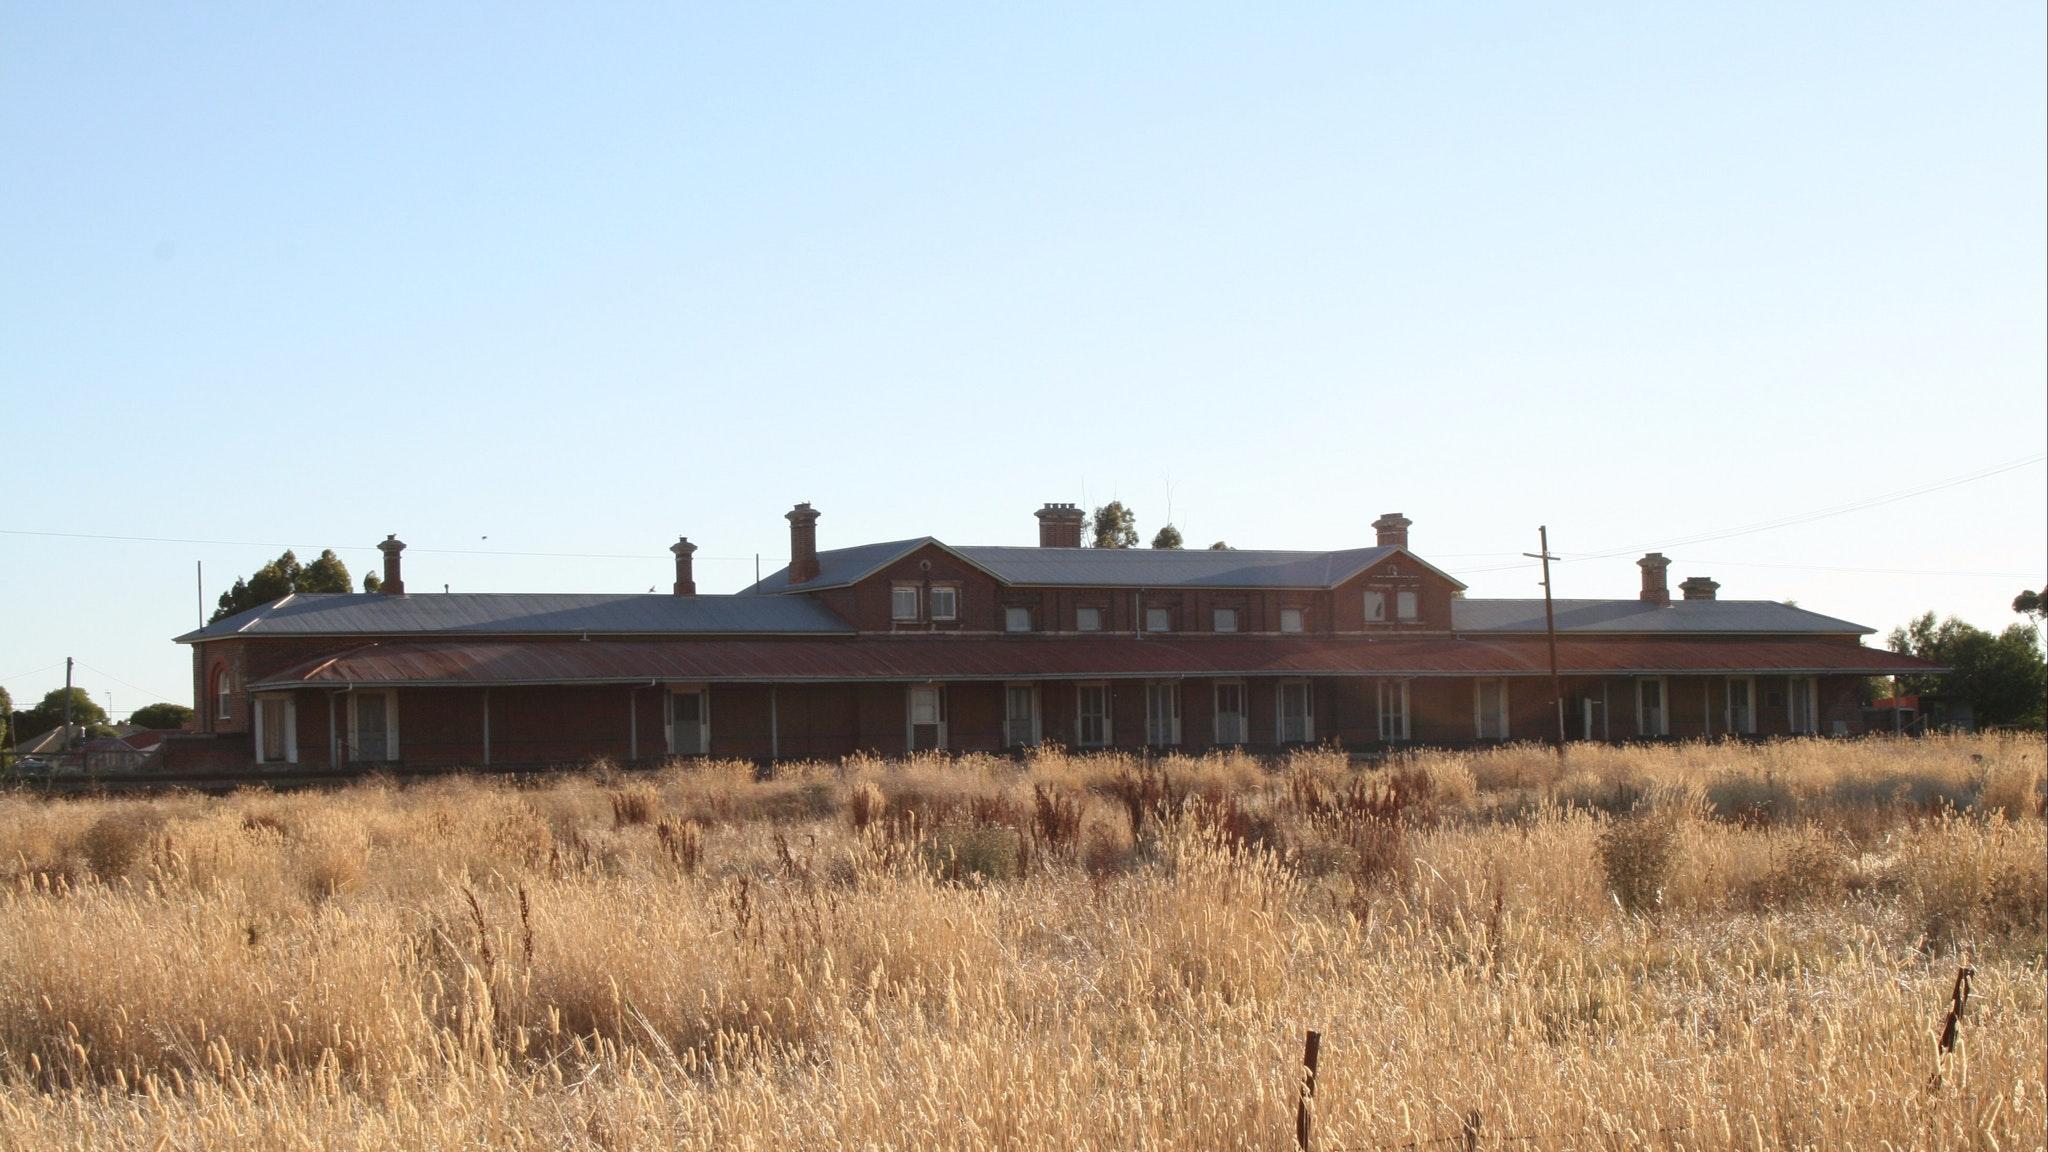 Serviceton Railway Station